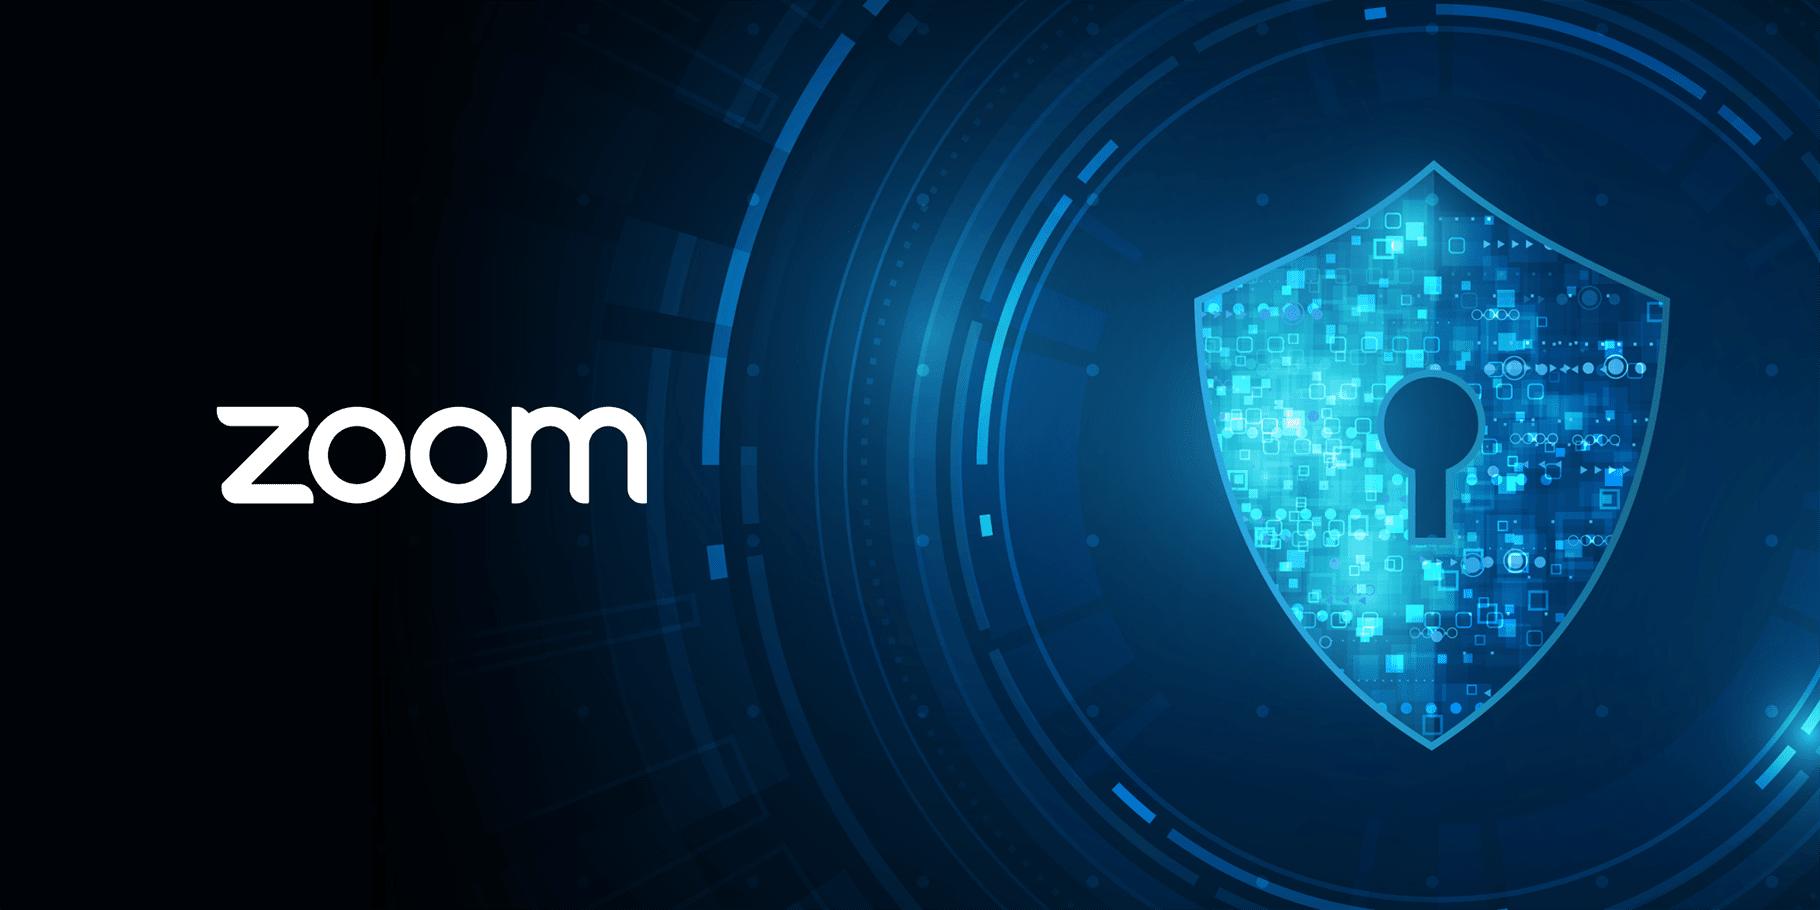 zoom sec - Zoom περισσότερες επιλογές ασφαλείας